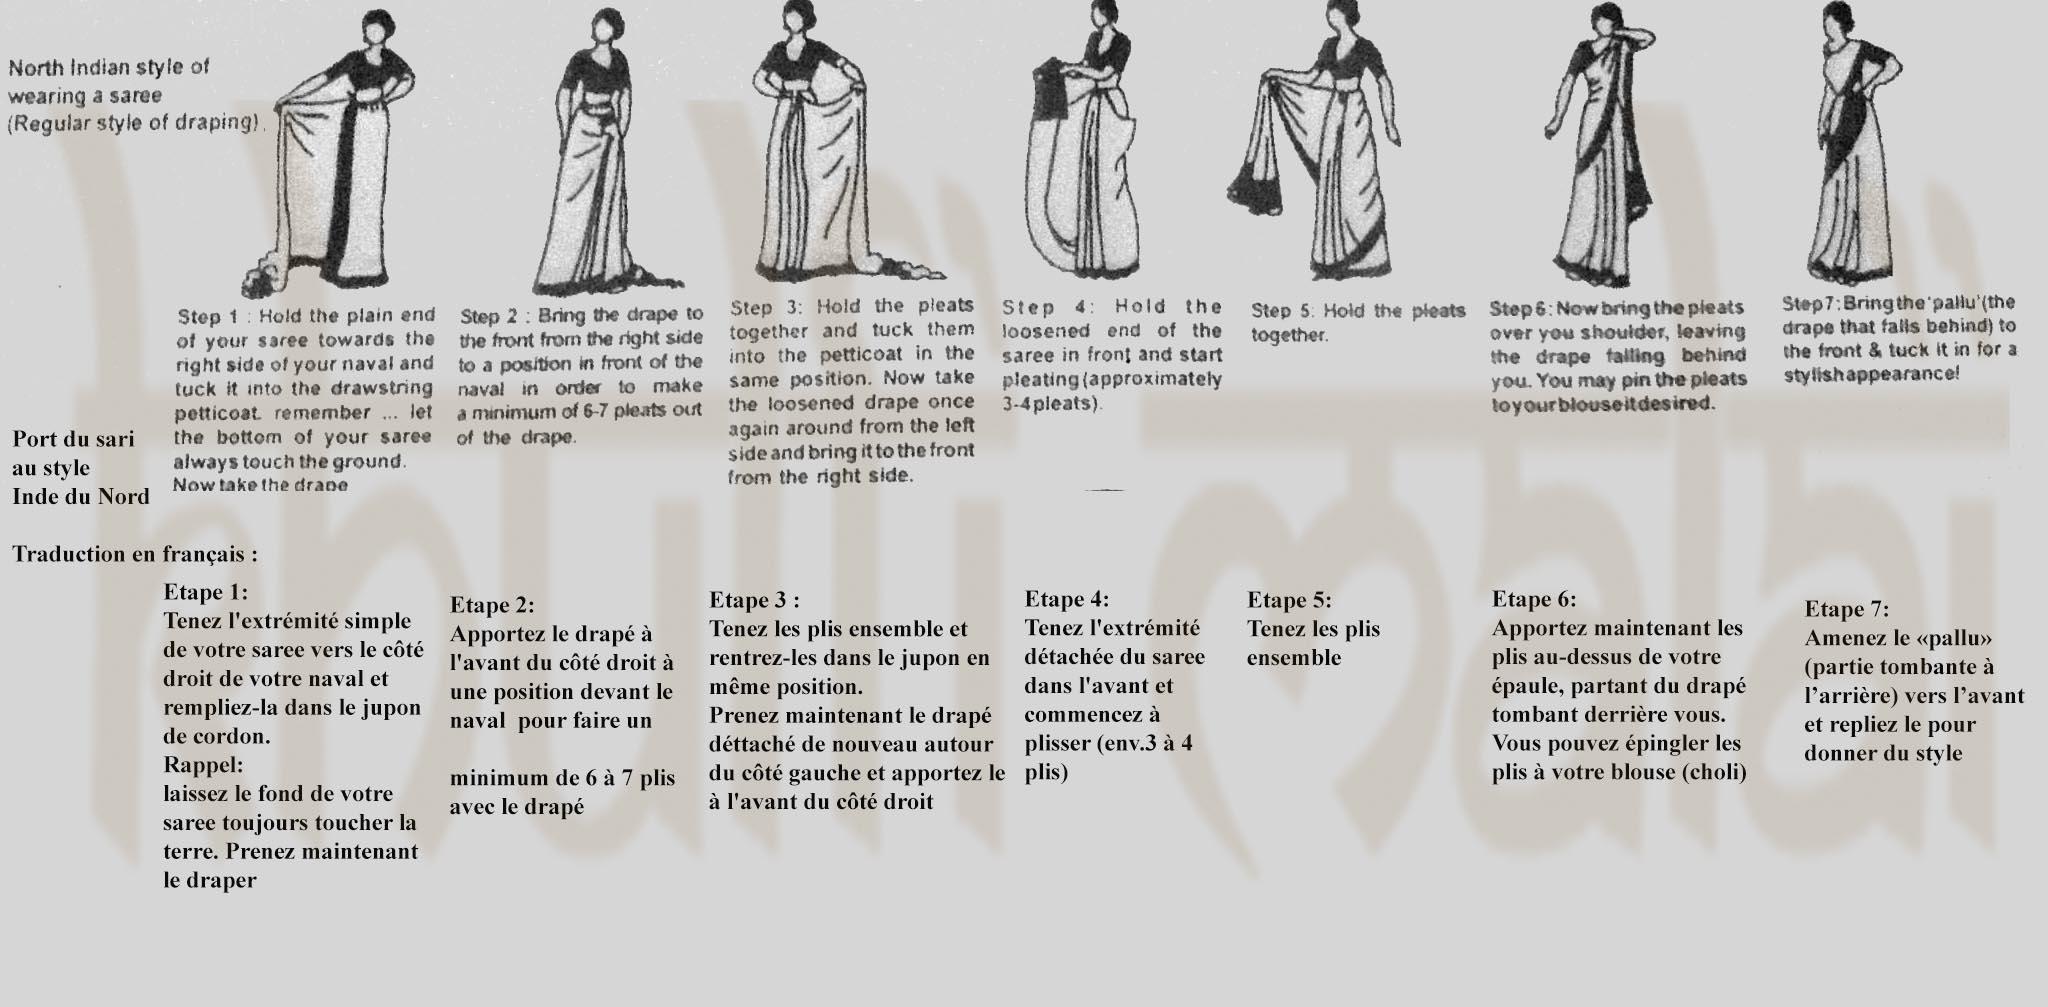 Le sari indien khulfi mala danse bollywood pariskhulfi mala danse bollywood paris - Comment mettre un lustre ...